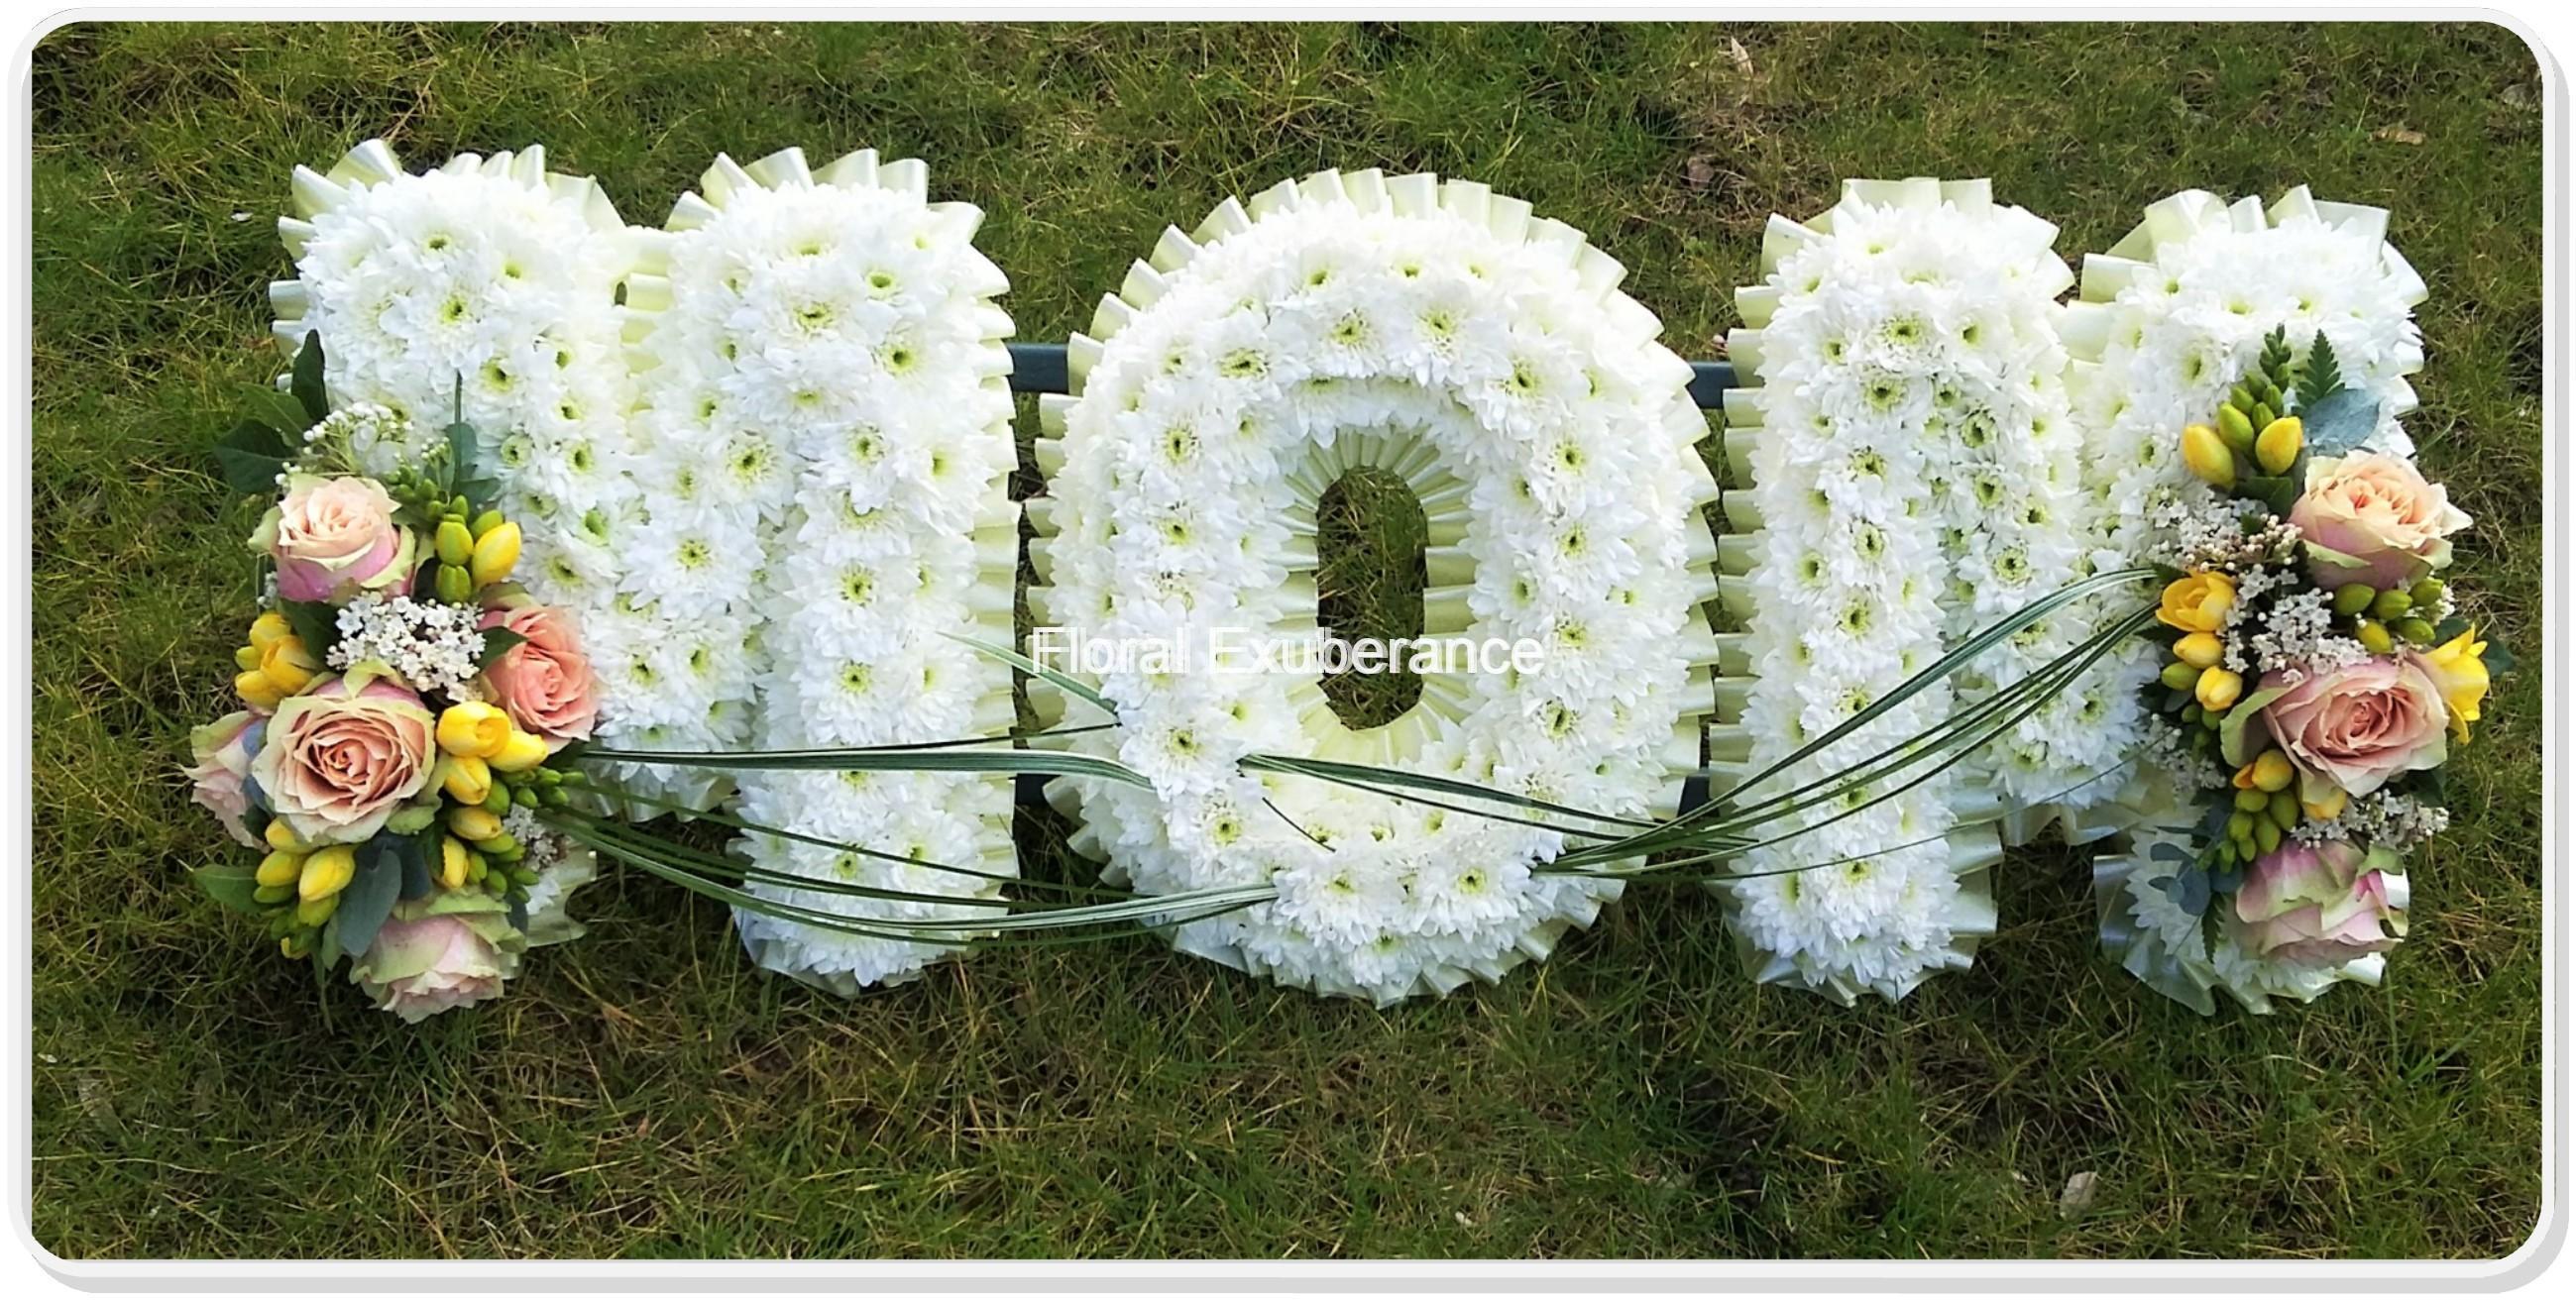 Mom funeral flower letters floral exuberance mom funeral flower letters izmirmasajfo Gallery